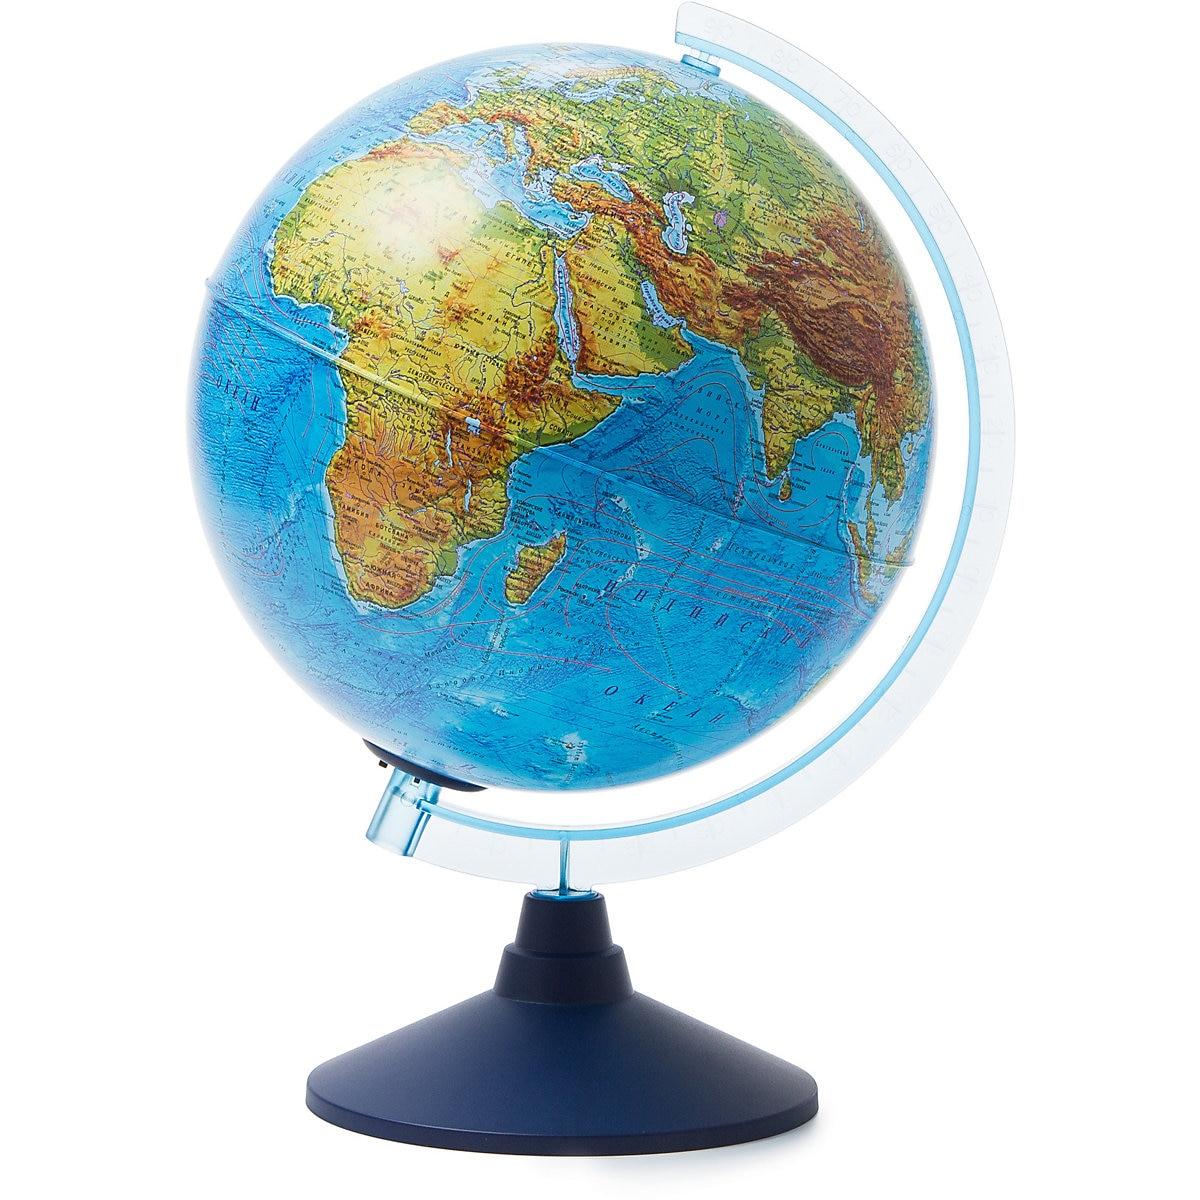 GLOBEN Desk Set 7327231 globe Accessories Organizer for office and school schools offices MTpromo globen desk set 7327225 globe accessories organizer for office and school schools offices